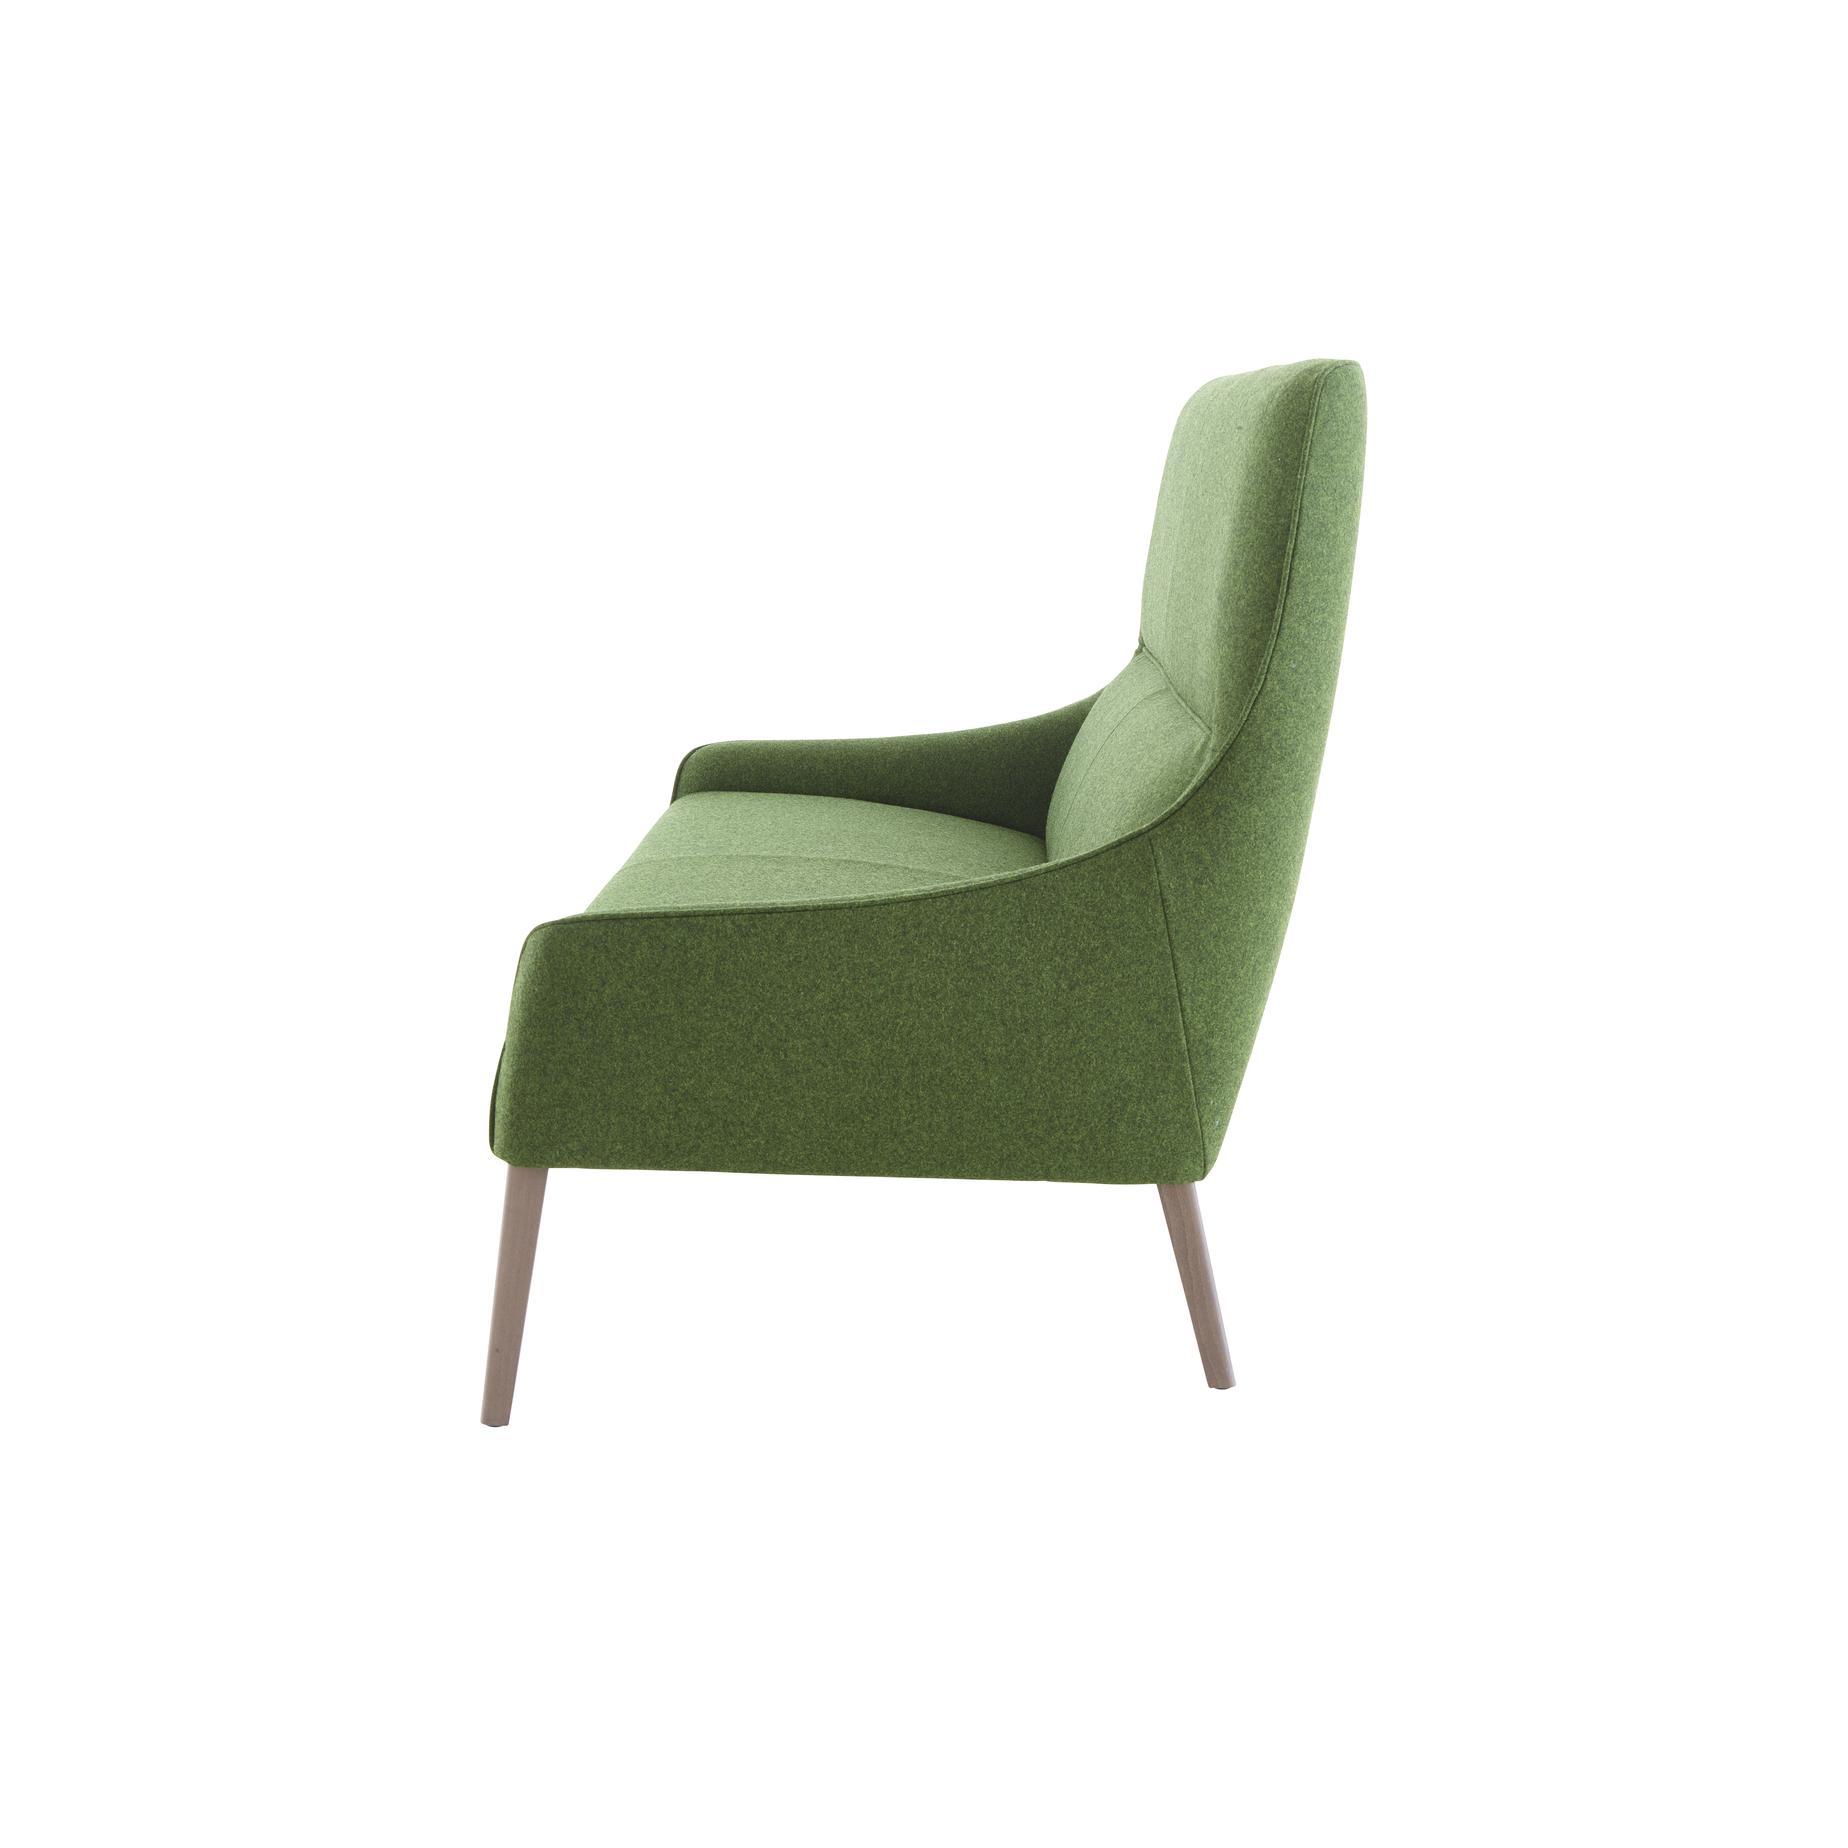 Mobilier De France Chalons En Champagne long island, upholstery designer : n. nasrallah & c. horner